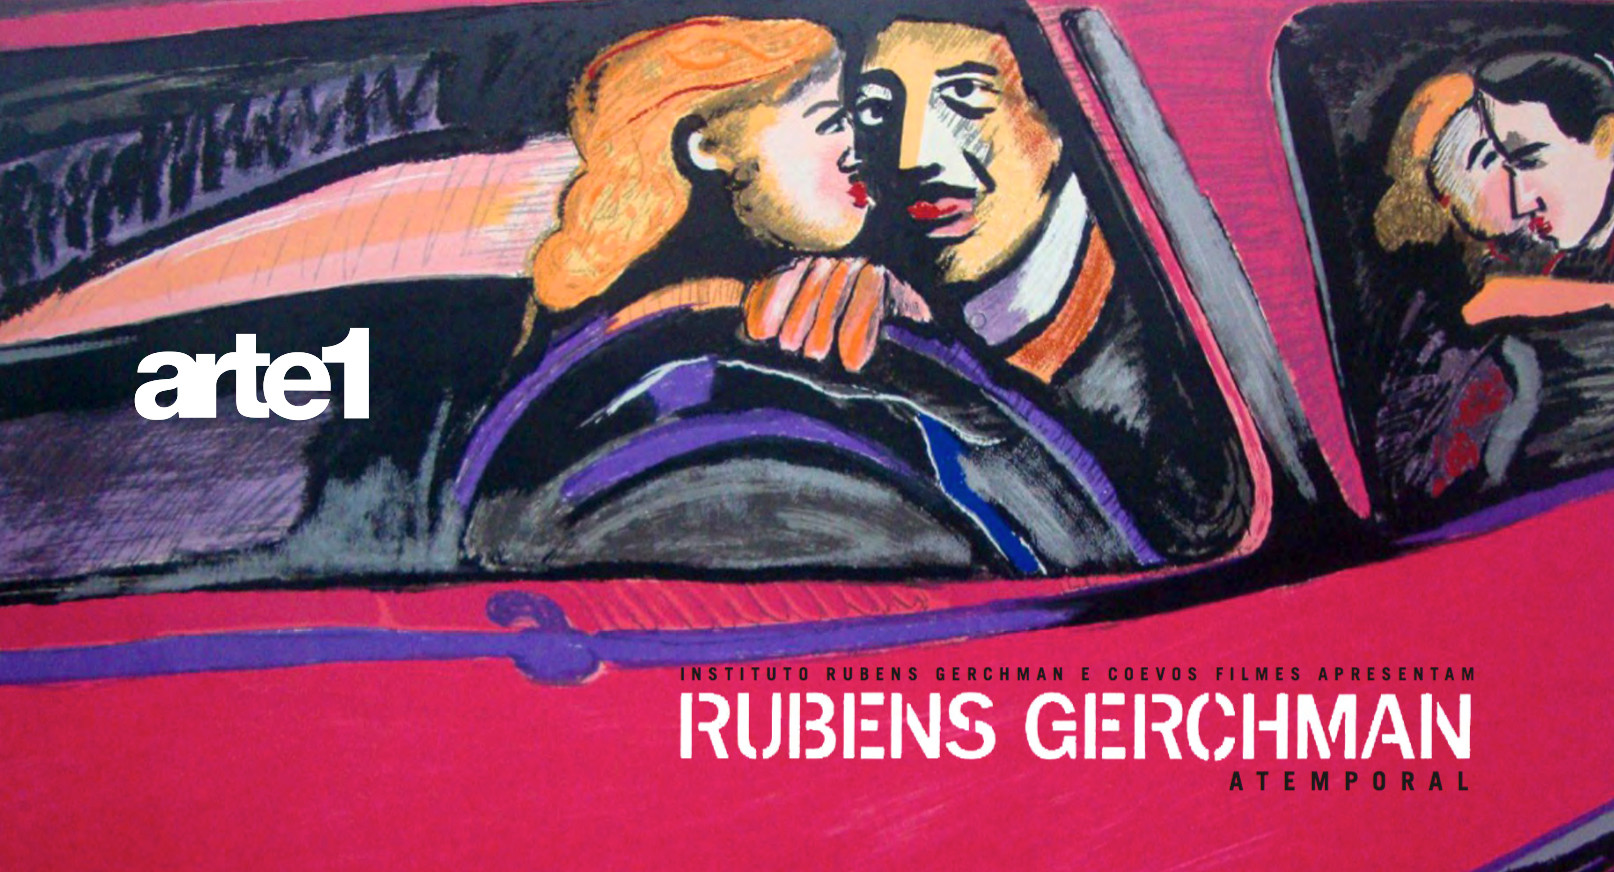 Rubens Gerchman - Atemporal